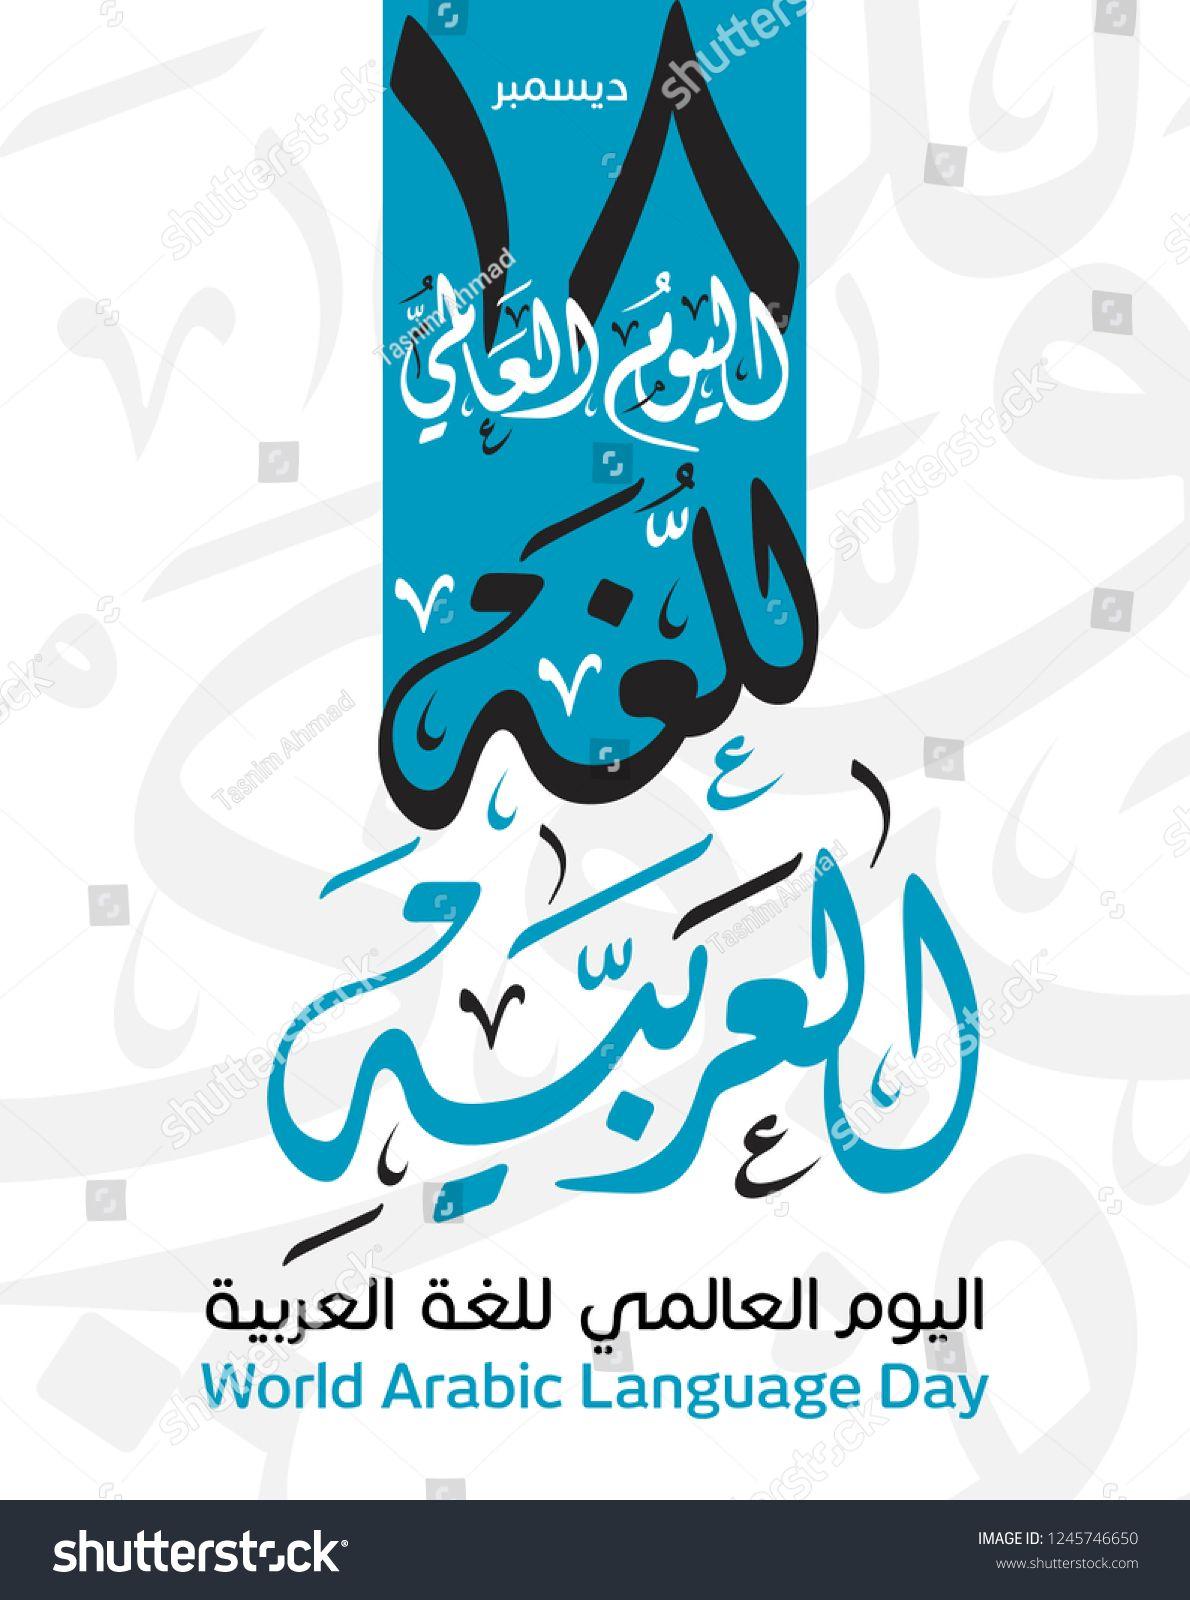 International Language Day Logo In Arabic Calligraphy Design Arabic Language Day Greeting I International Language Day Craft Business Cards Calligraphy Design